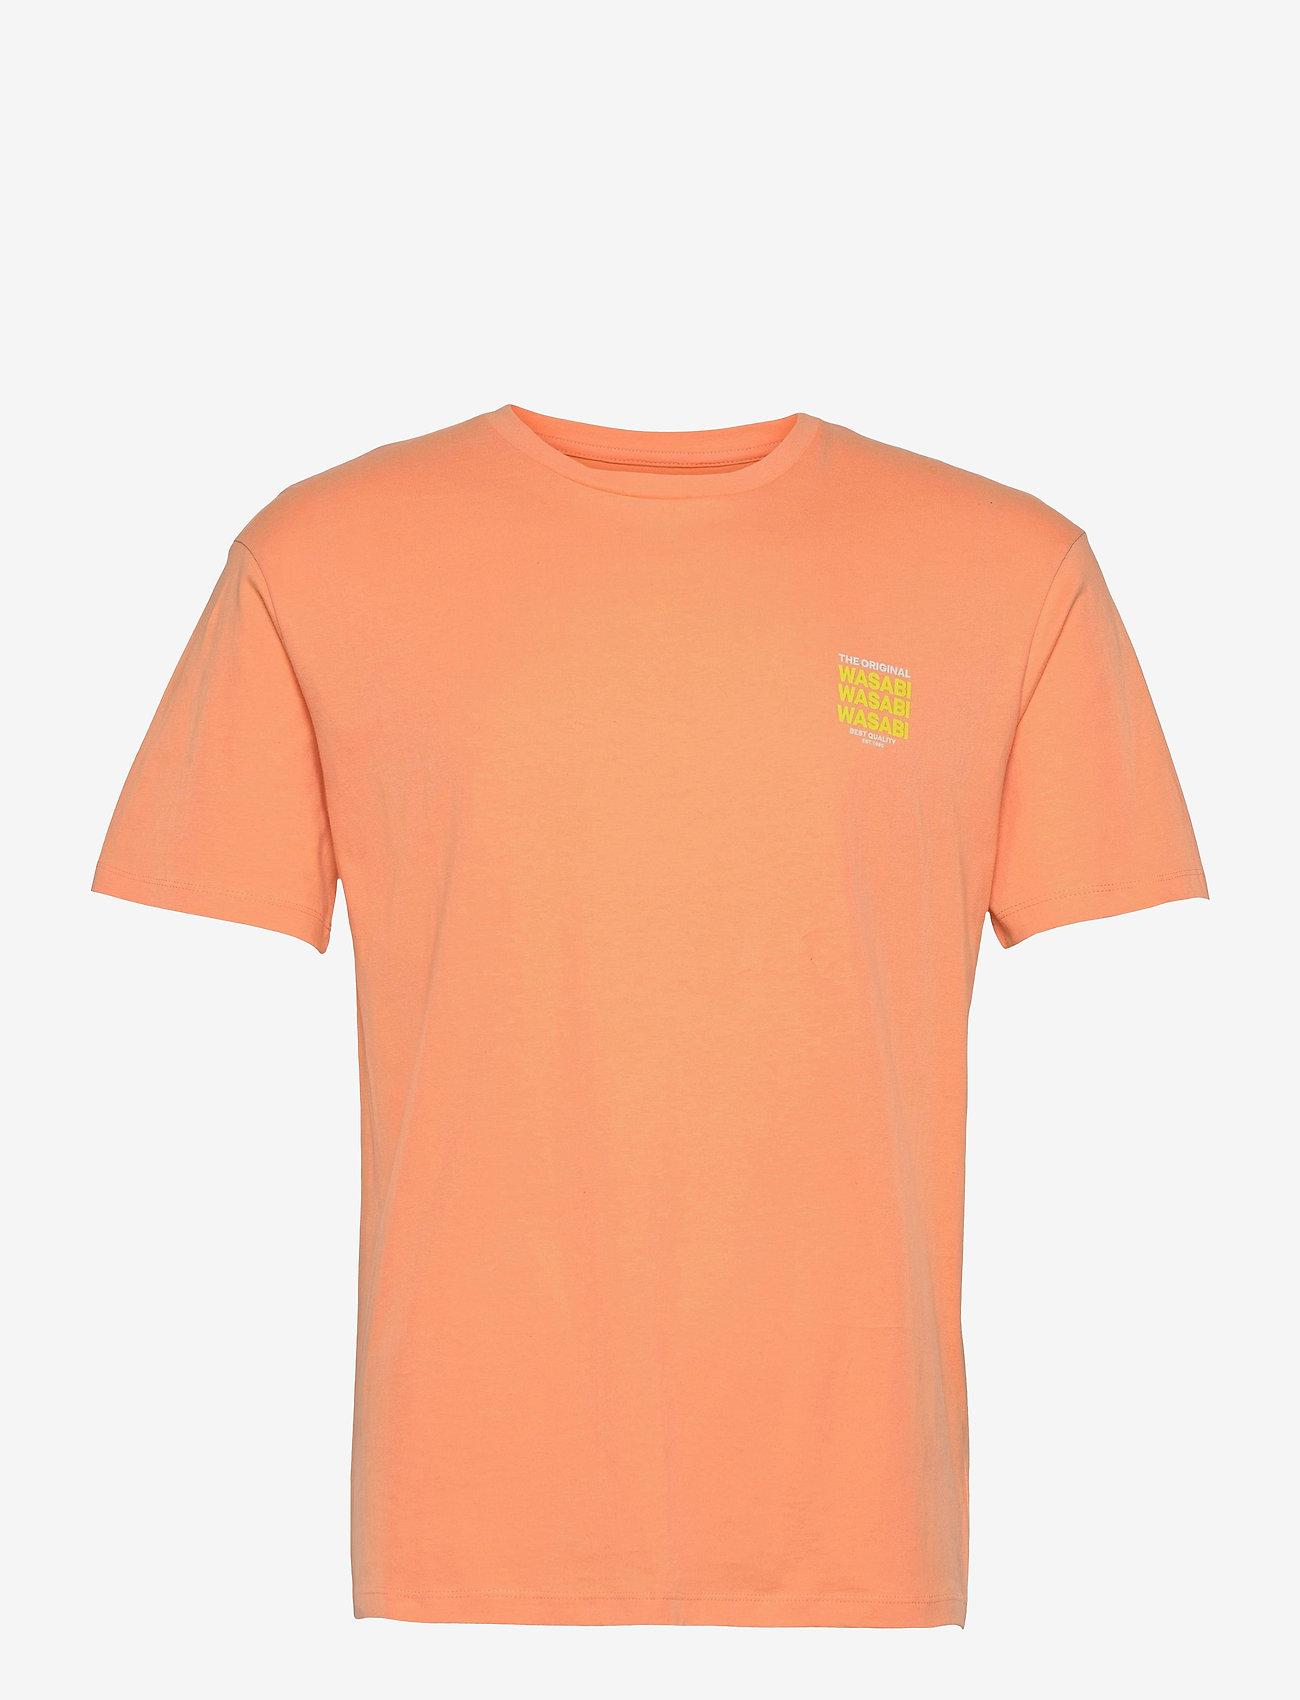 Jack & Jones - JORHUNGRY TEE SS CREW NECK - basic t-shirts - shell coral - 0